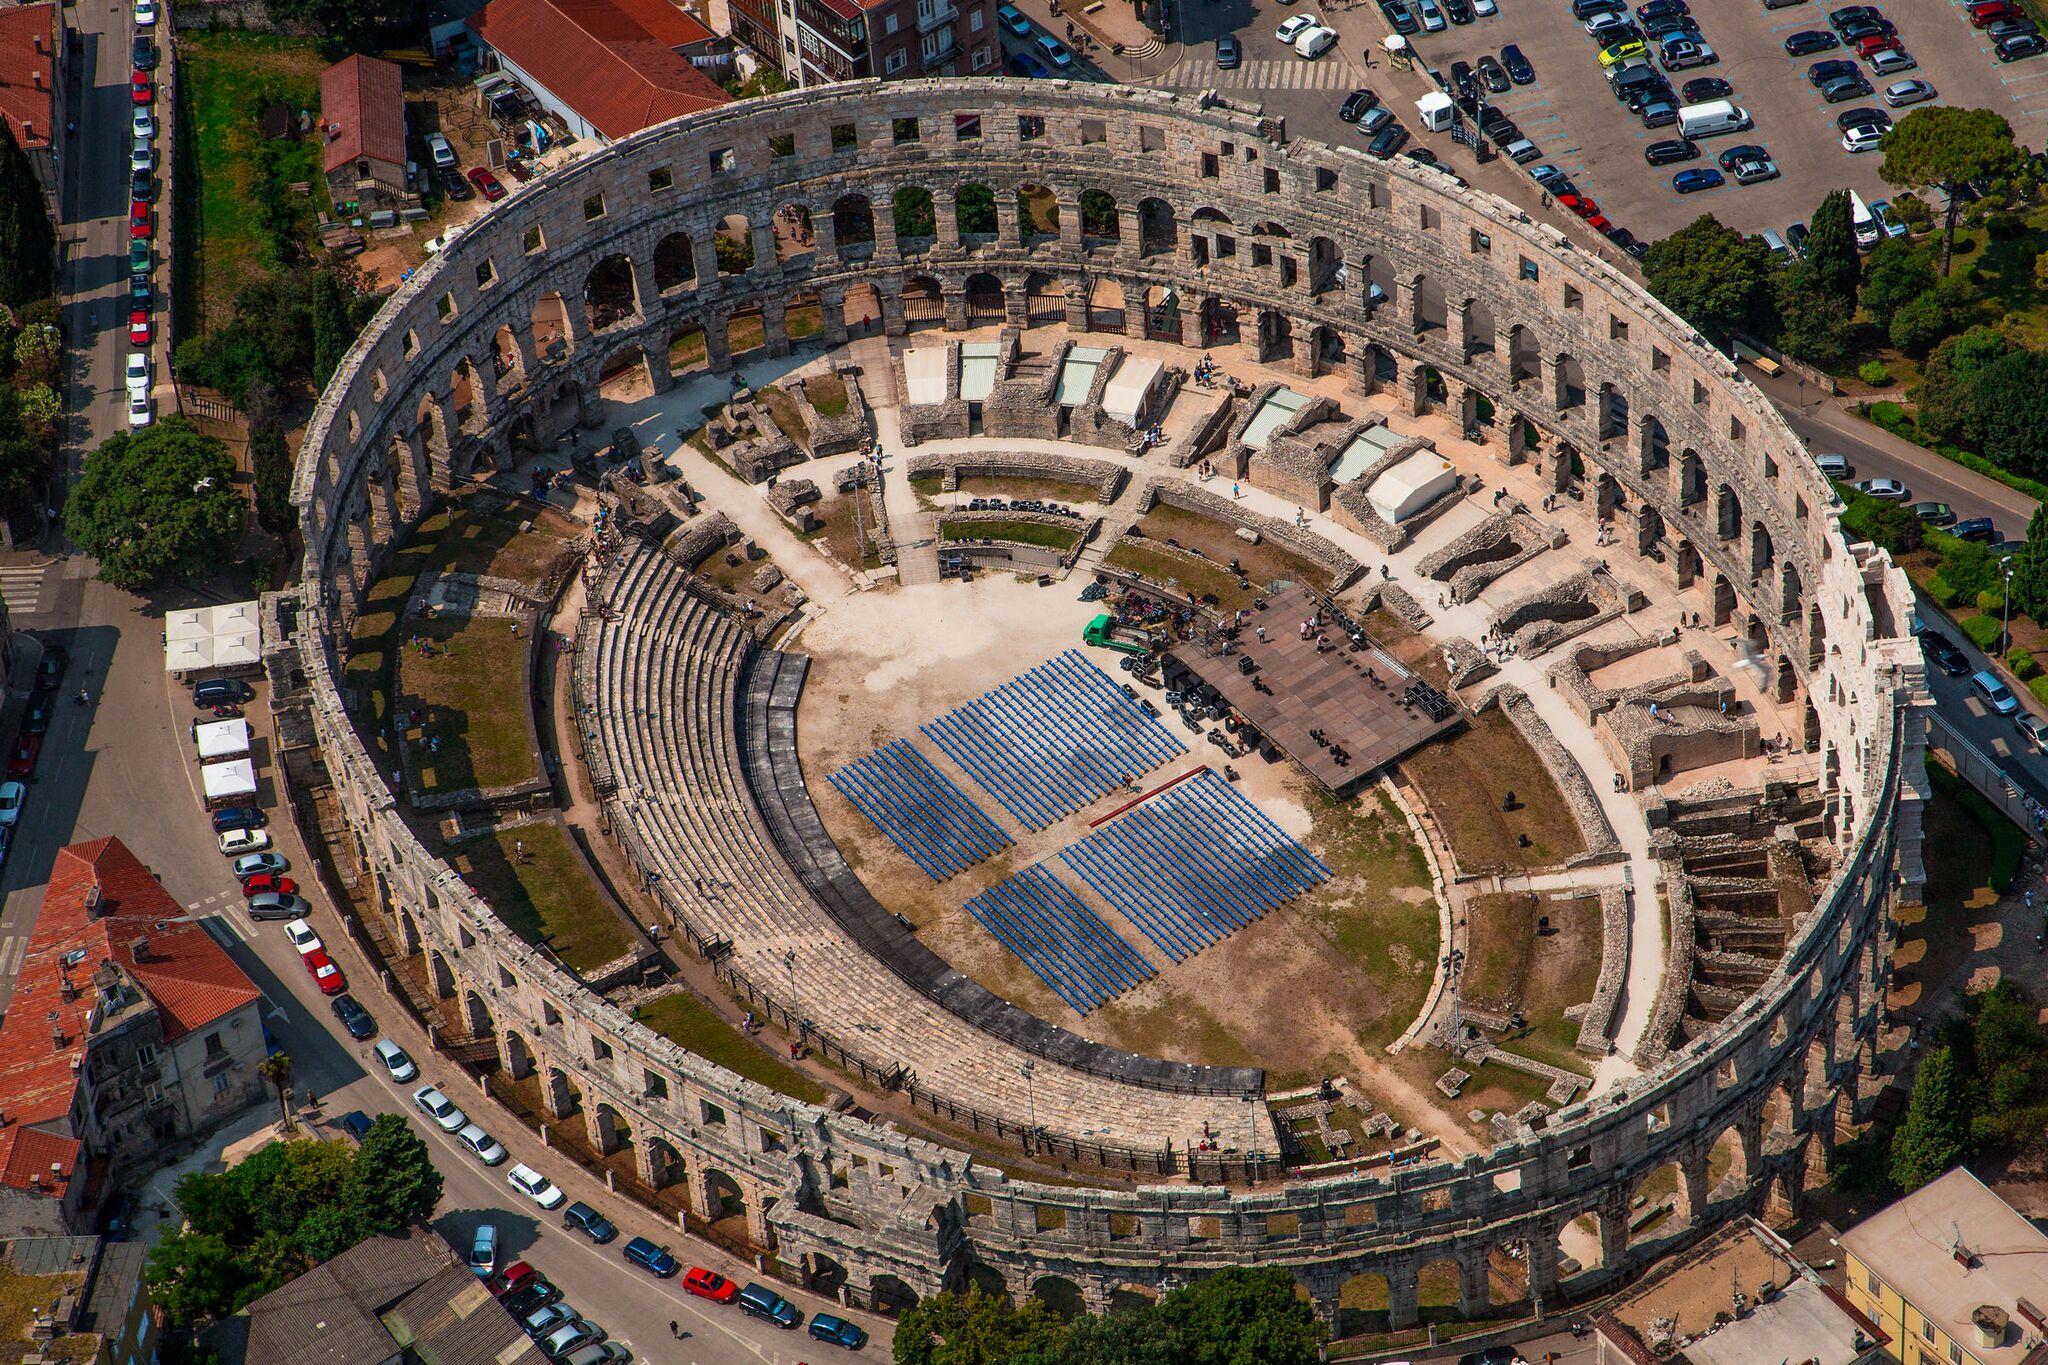 Beautiful Places in Croatia - Pula Arena